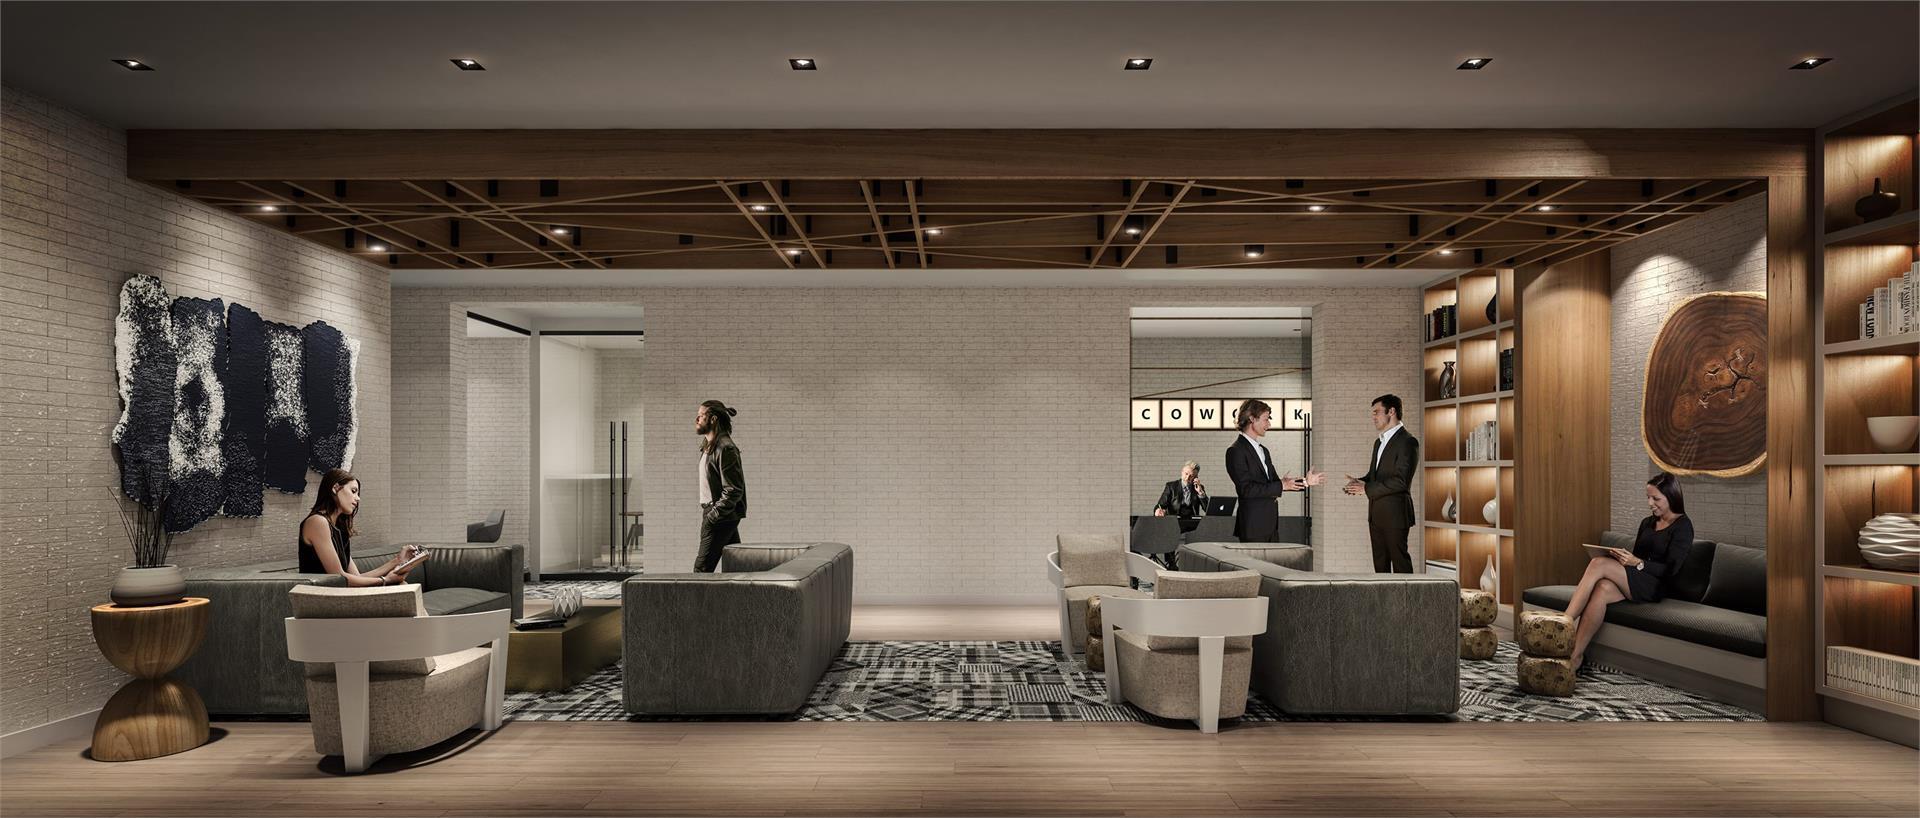 Interior photo of Empire Maverick Condos